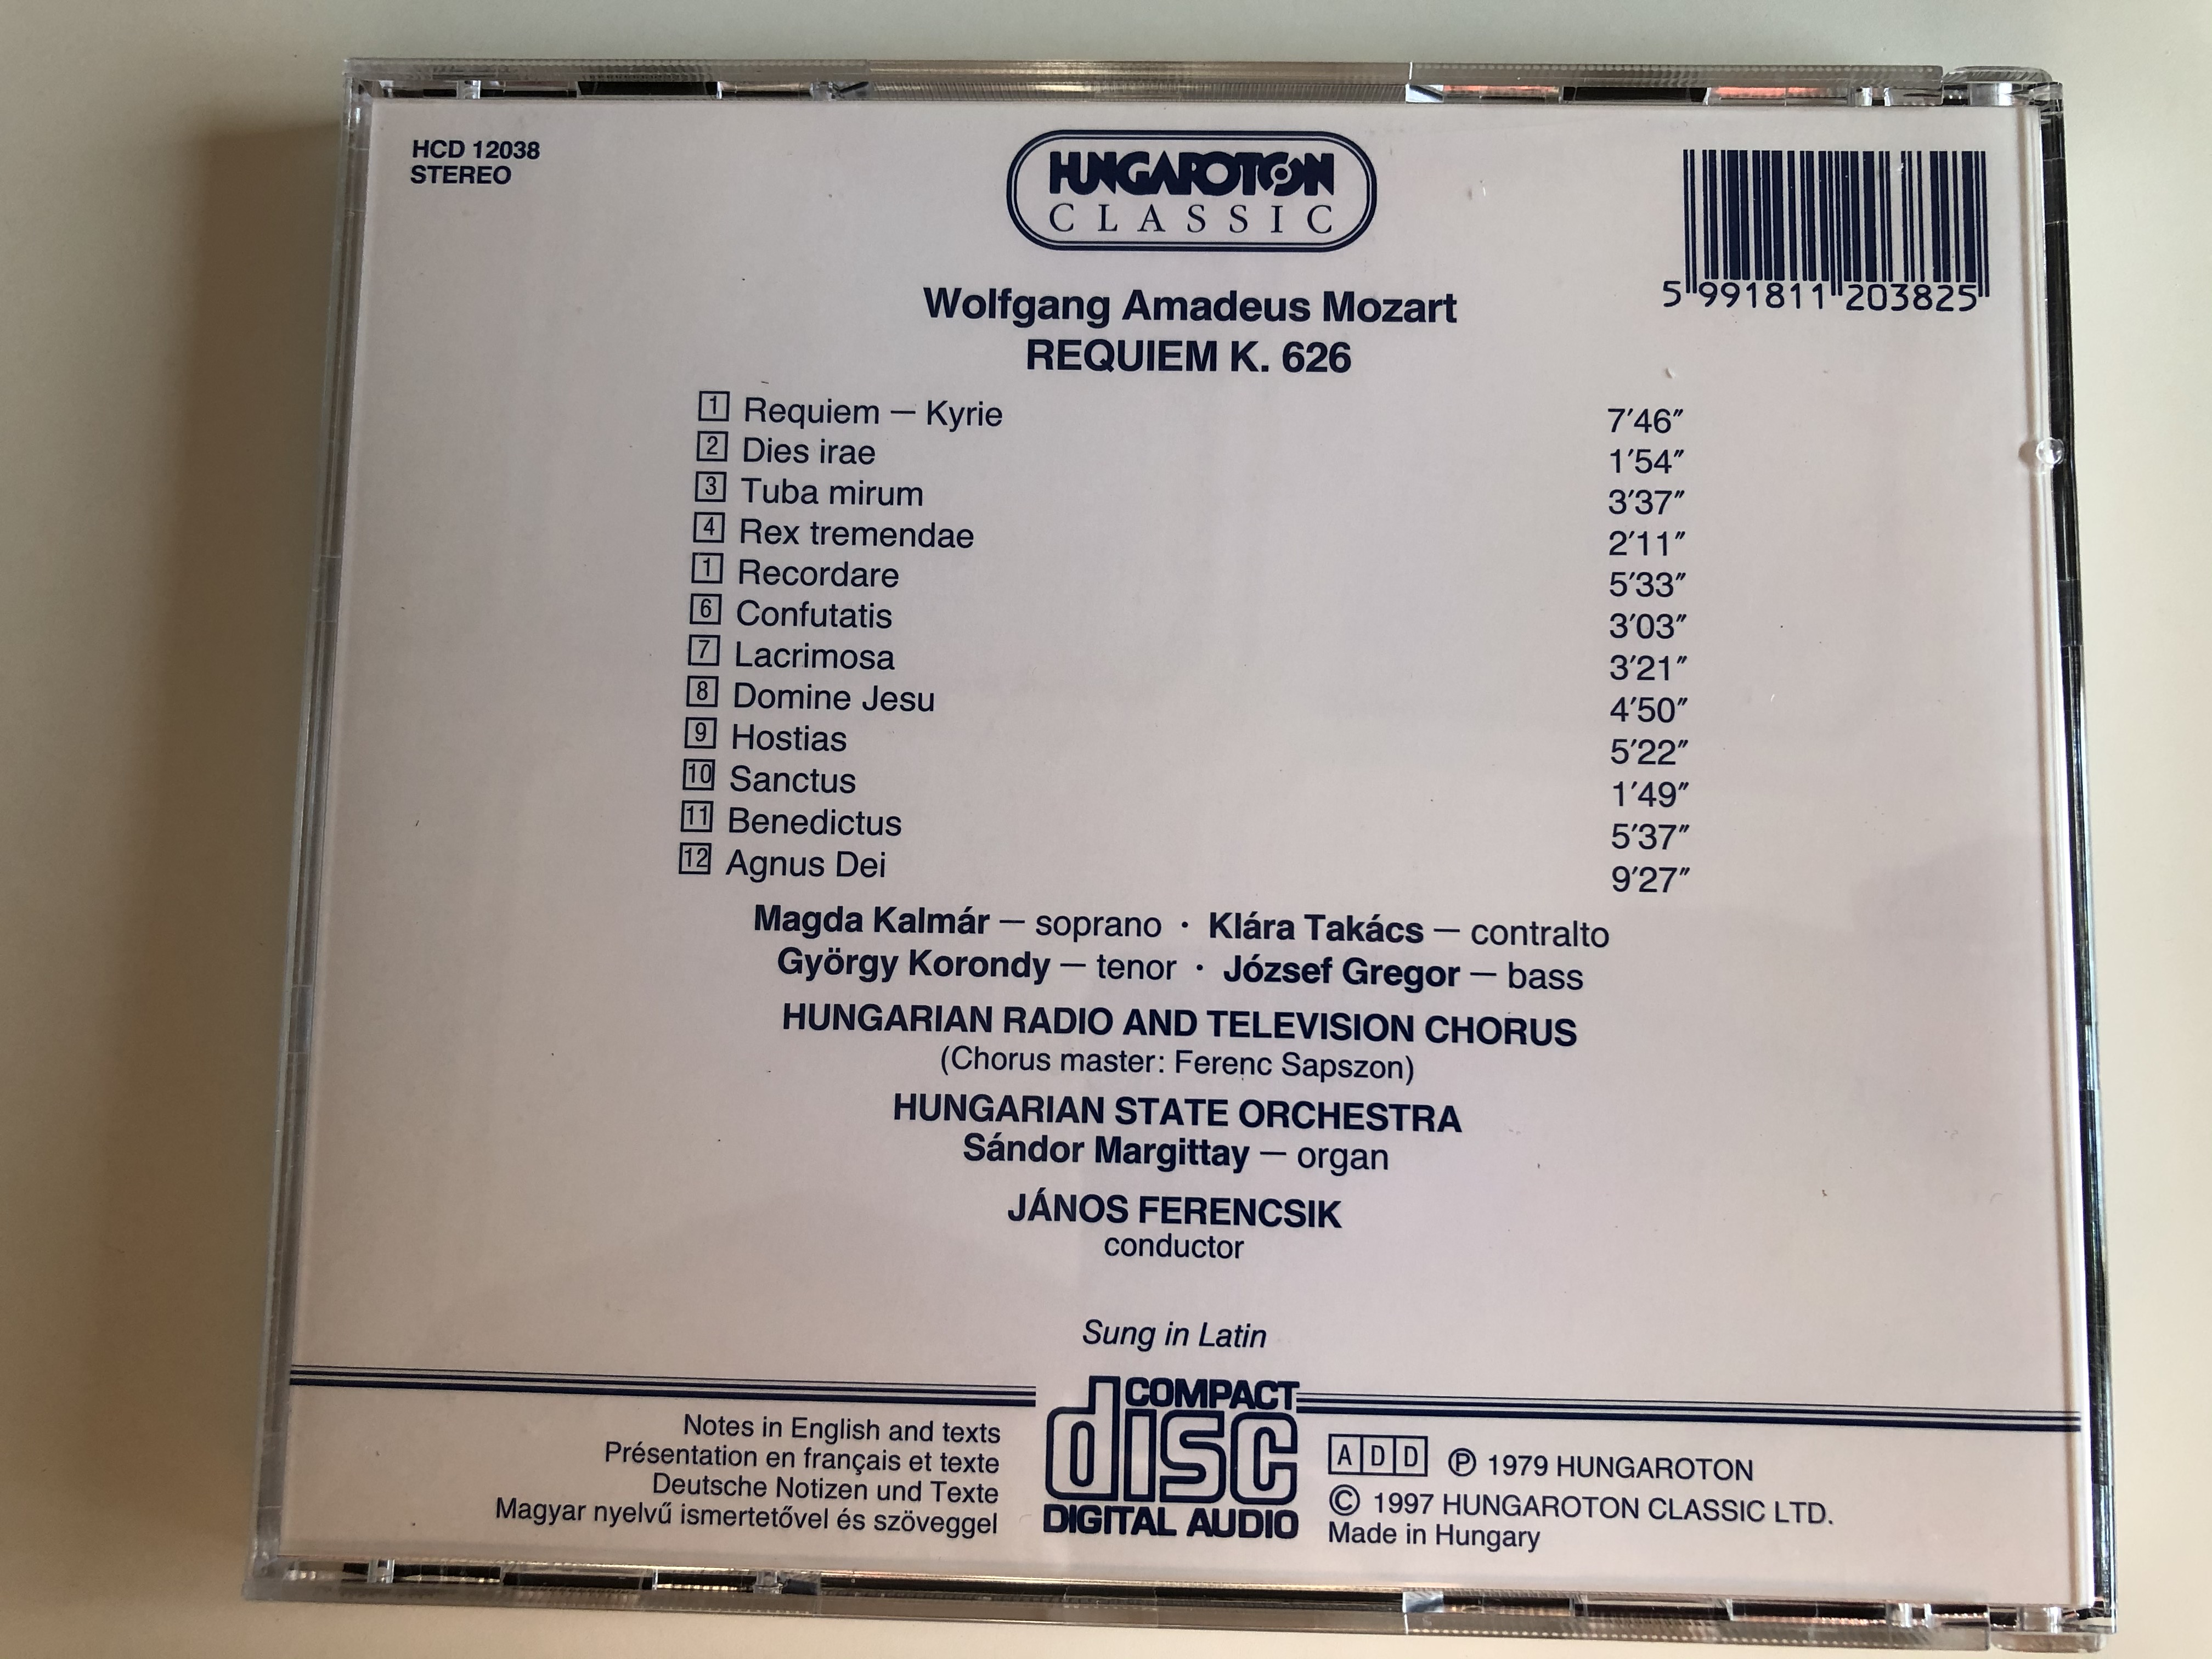 mozart-requiem-j-nos-ferencsik-magda-kalm-r-kl-ra-tak-cs-gy-rgy-korondy-j-zsef-gregor-hungarian-radio-and-television-chorus-hungarian-state-orchestra-hungaroton-classic-audio-cd-19-10-.jpg